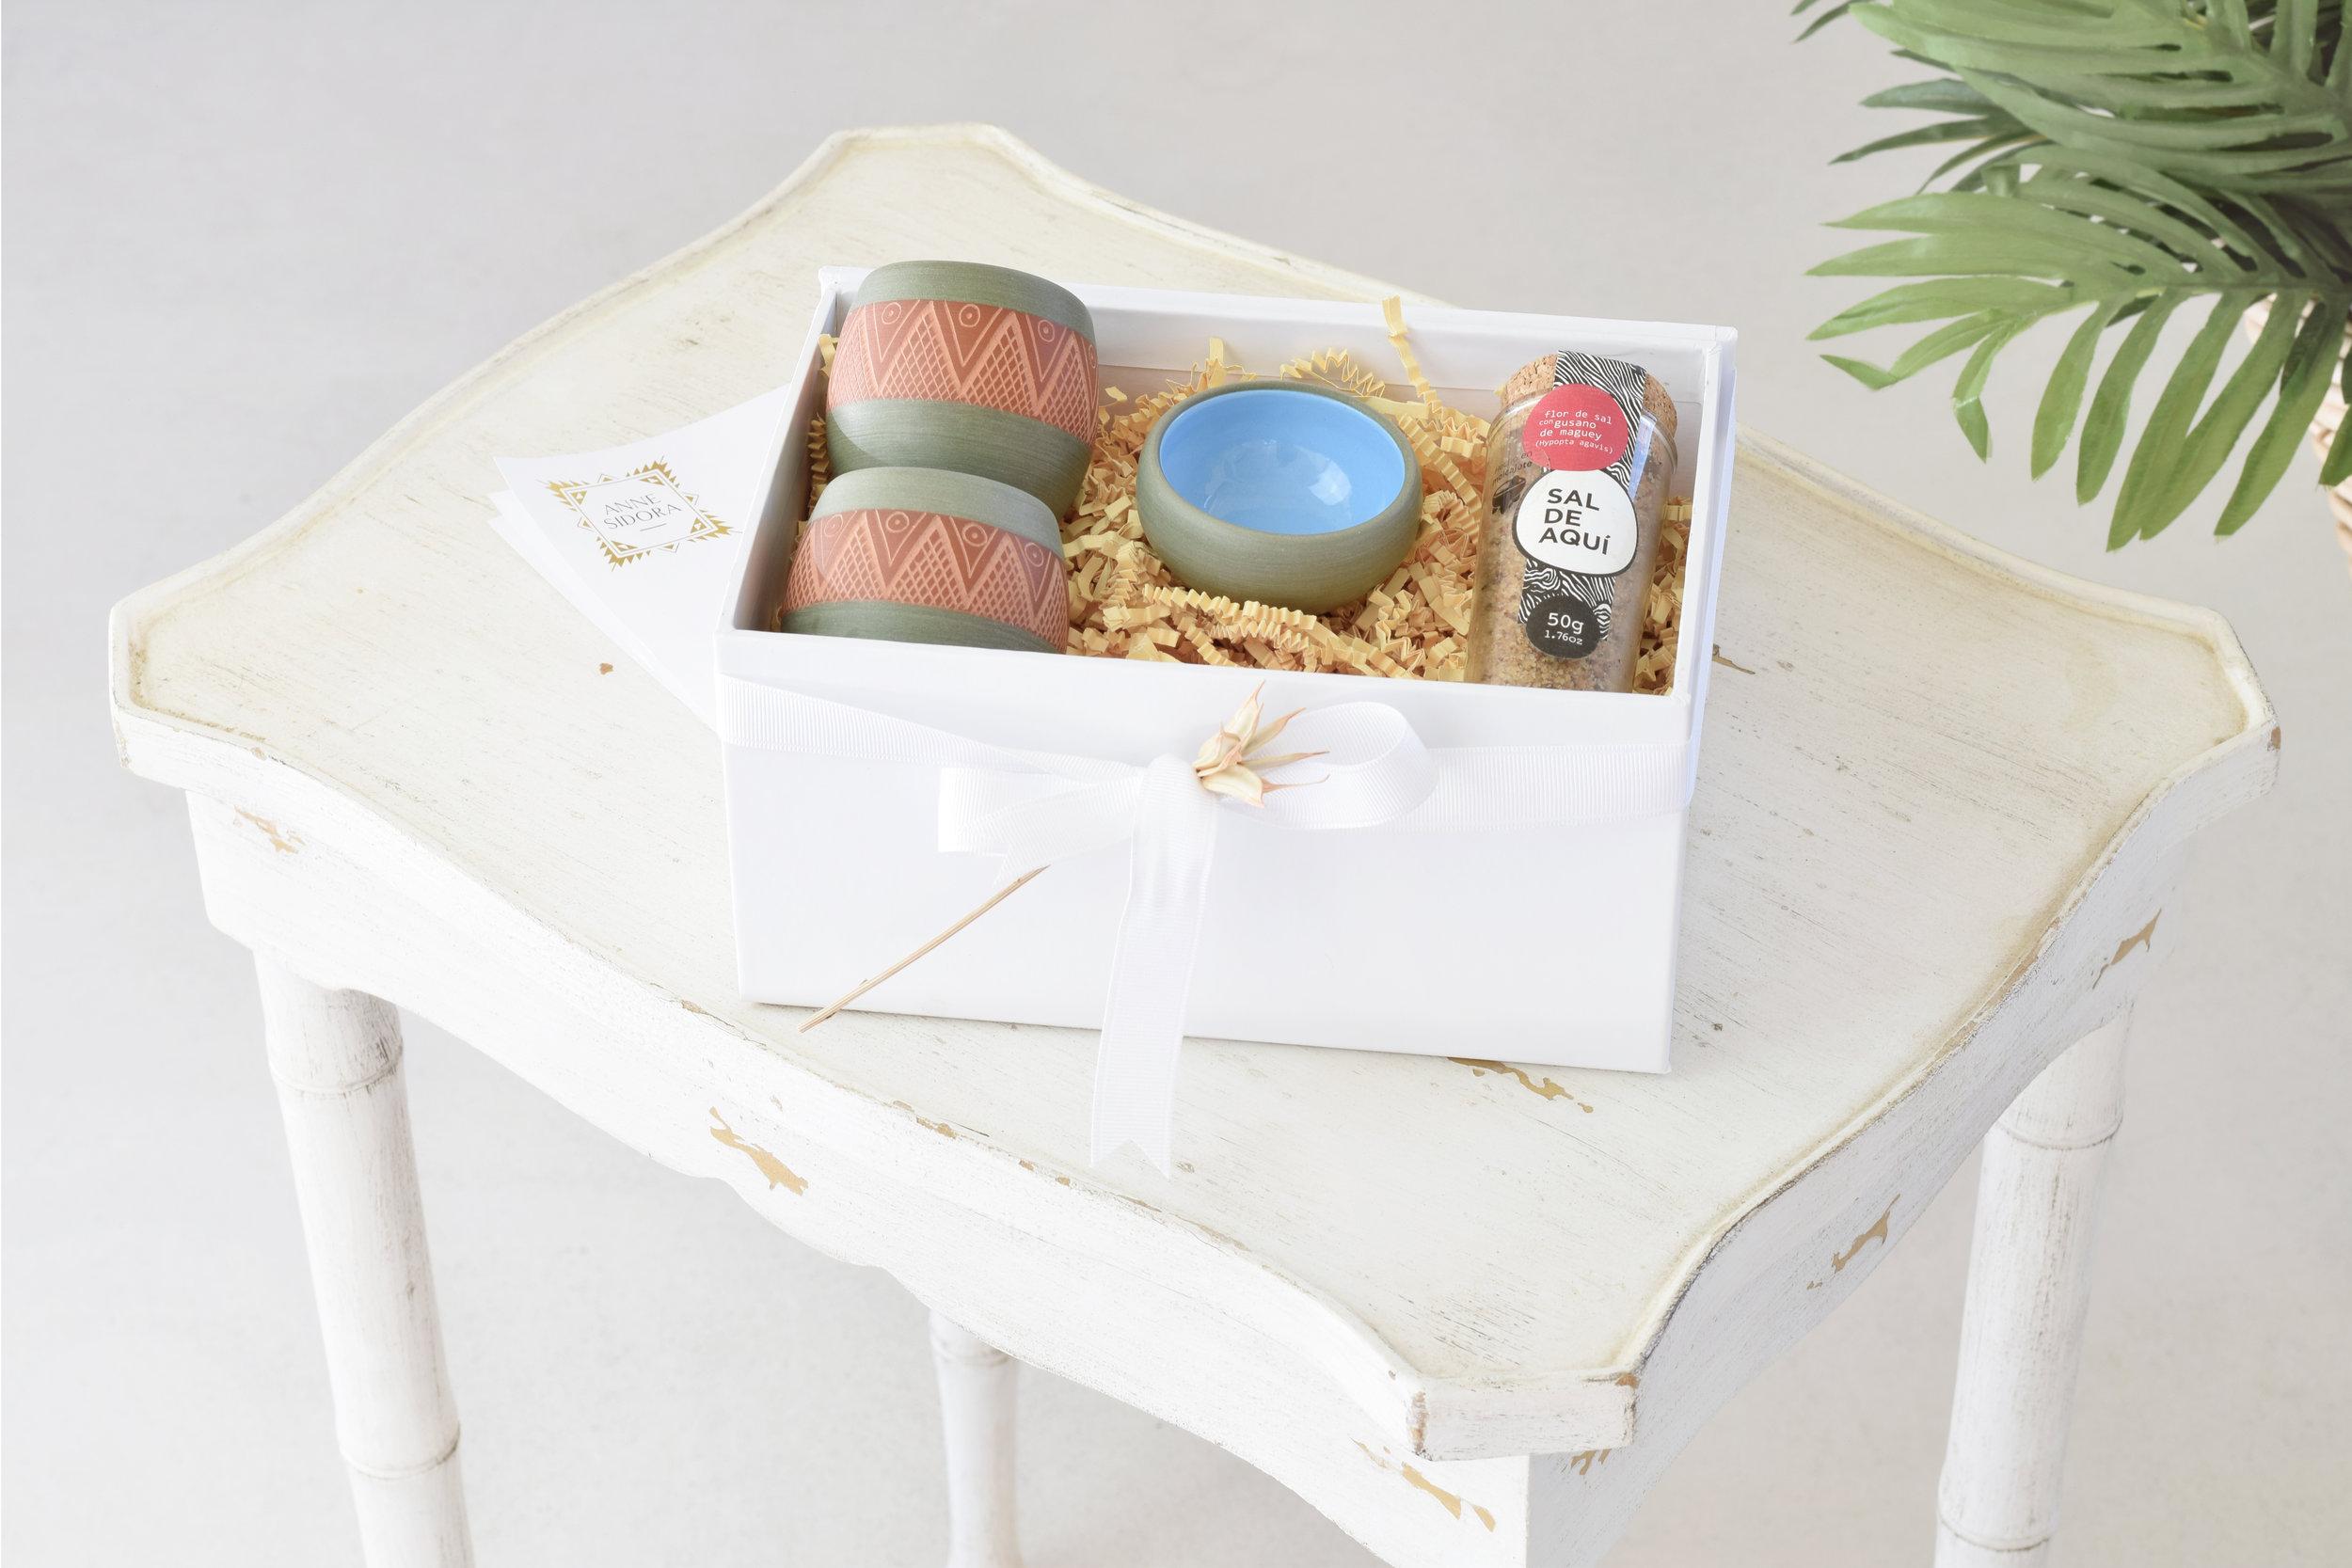 02-Anne_Sidora_Concept_Store_Gift_Box_Mezcal.jpg